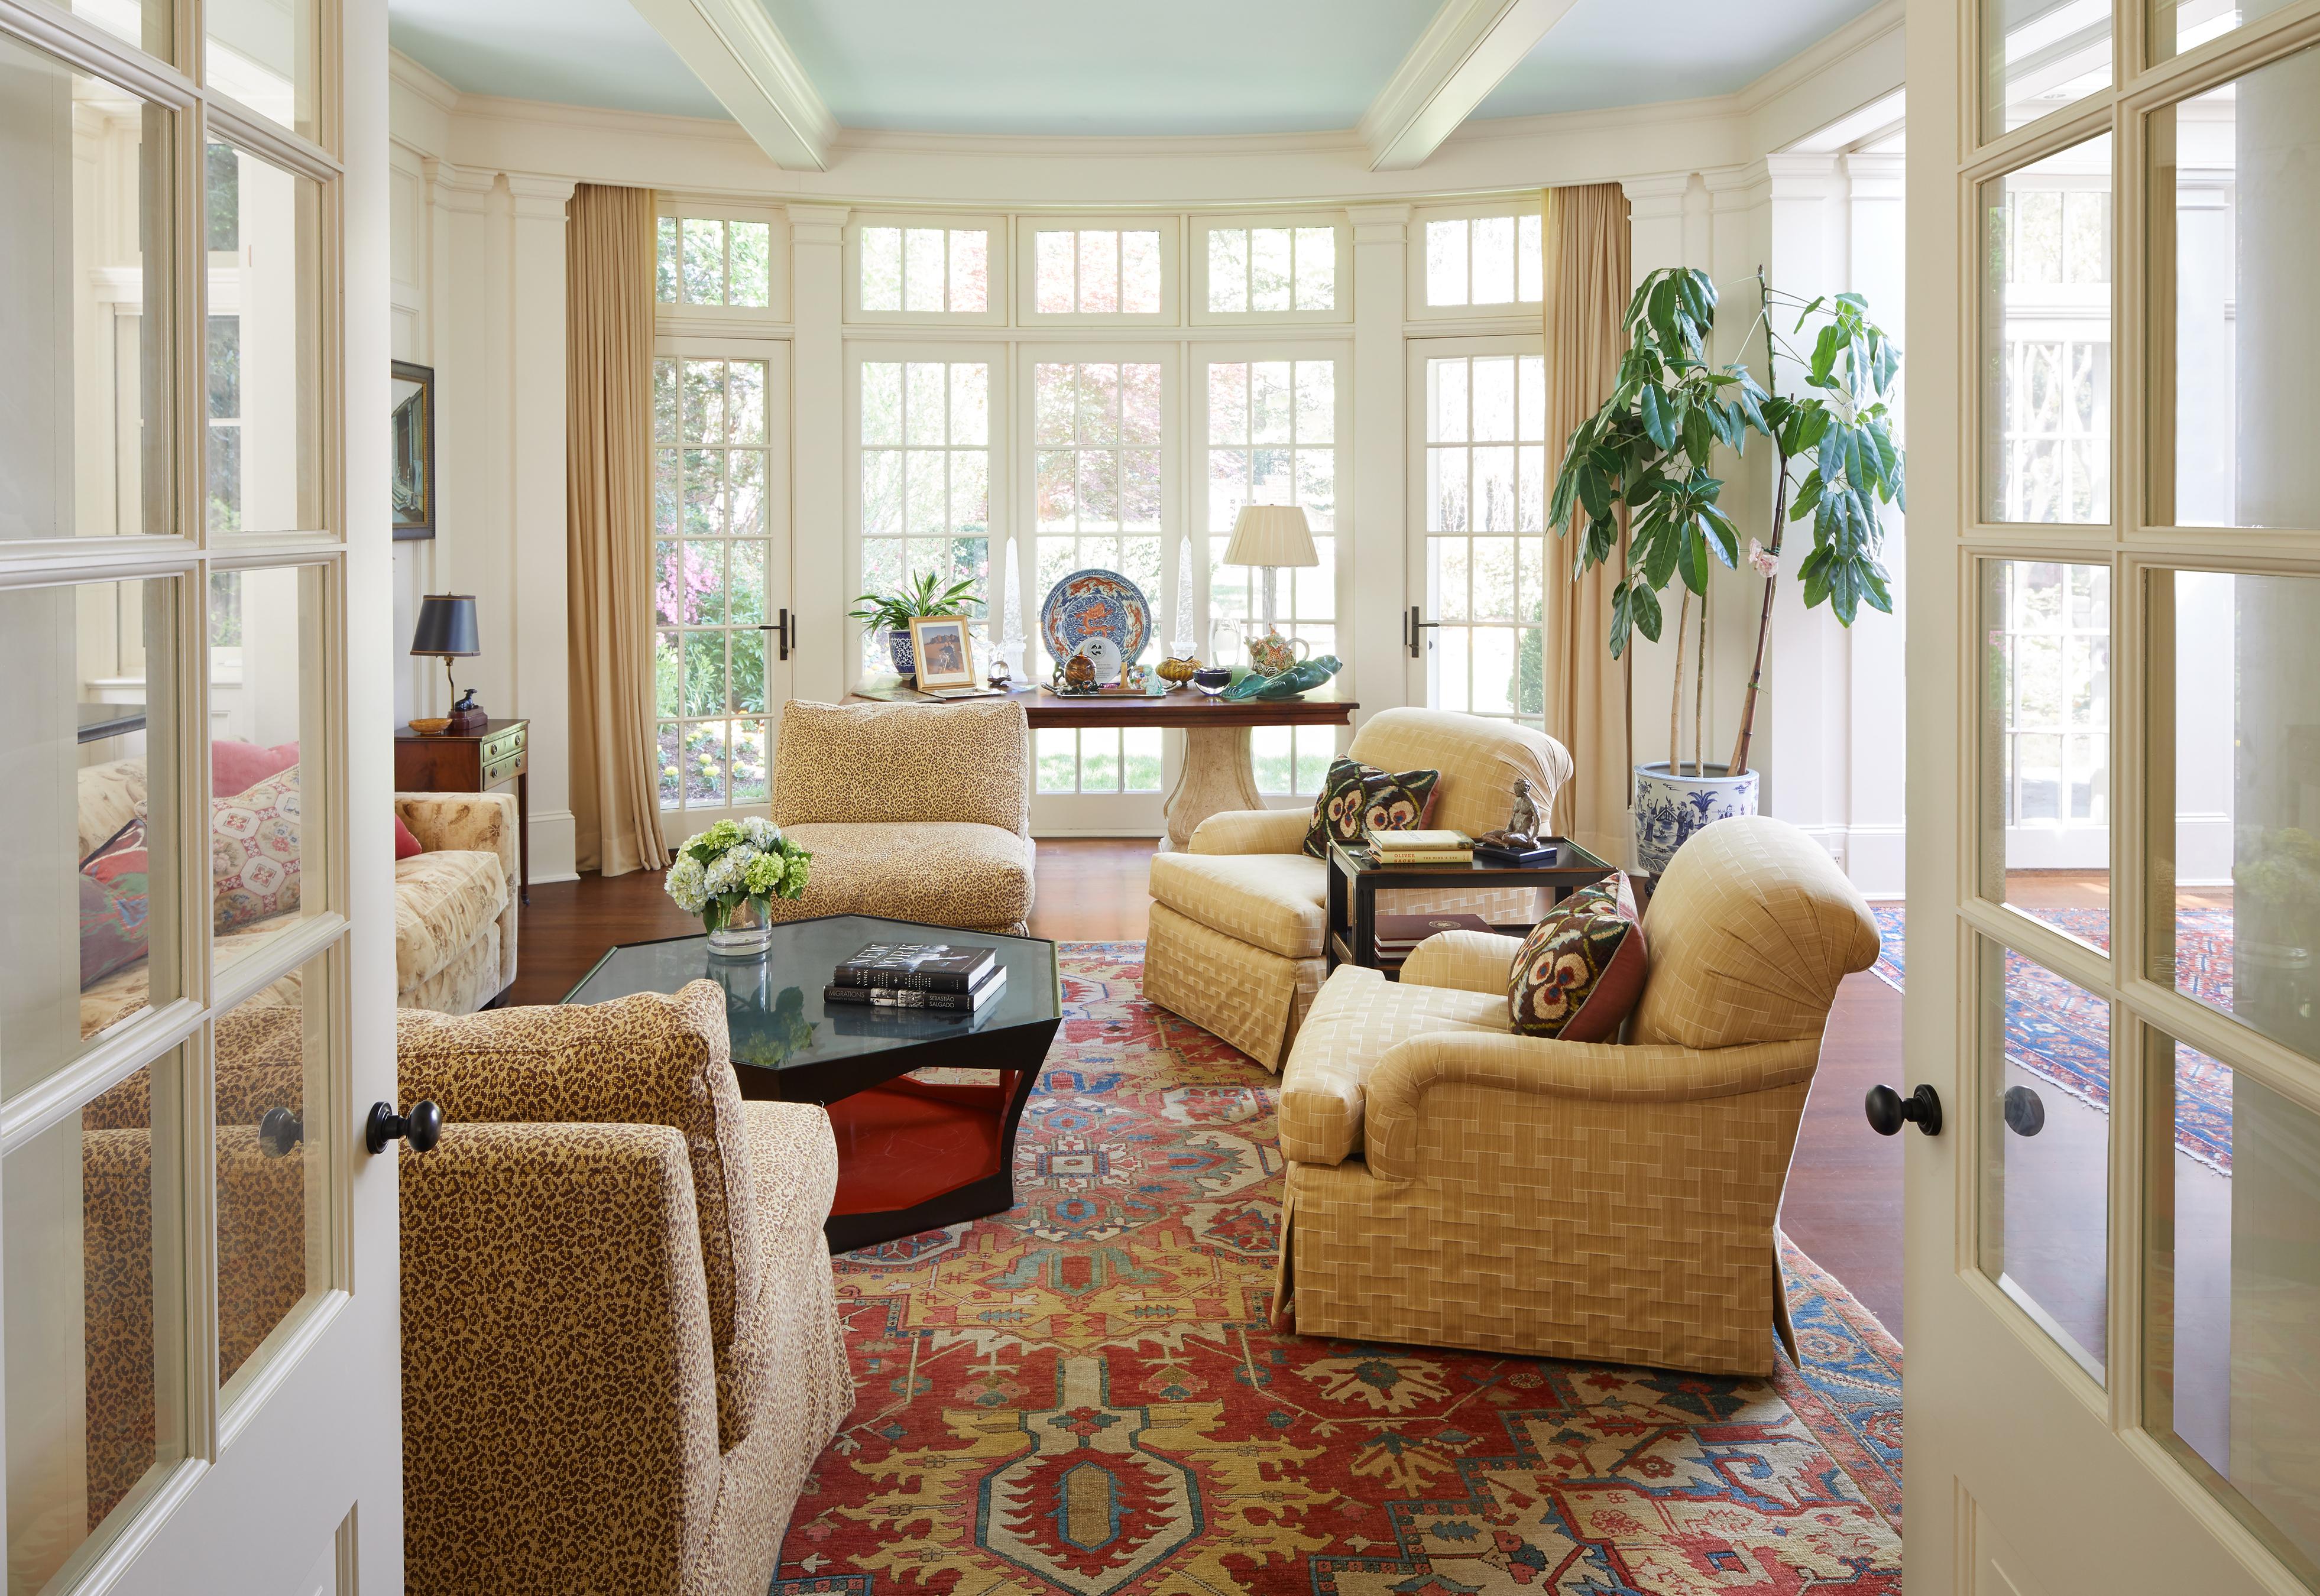 Admirable Inside Bill And Hillary Clintons Dc Home Cnn Style Interior Design Ideas Oteneahmetsinanyavuzinfo